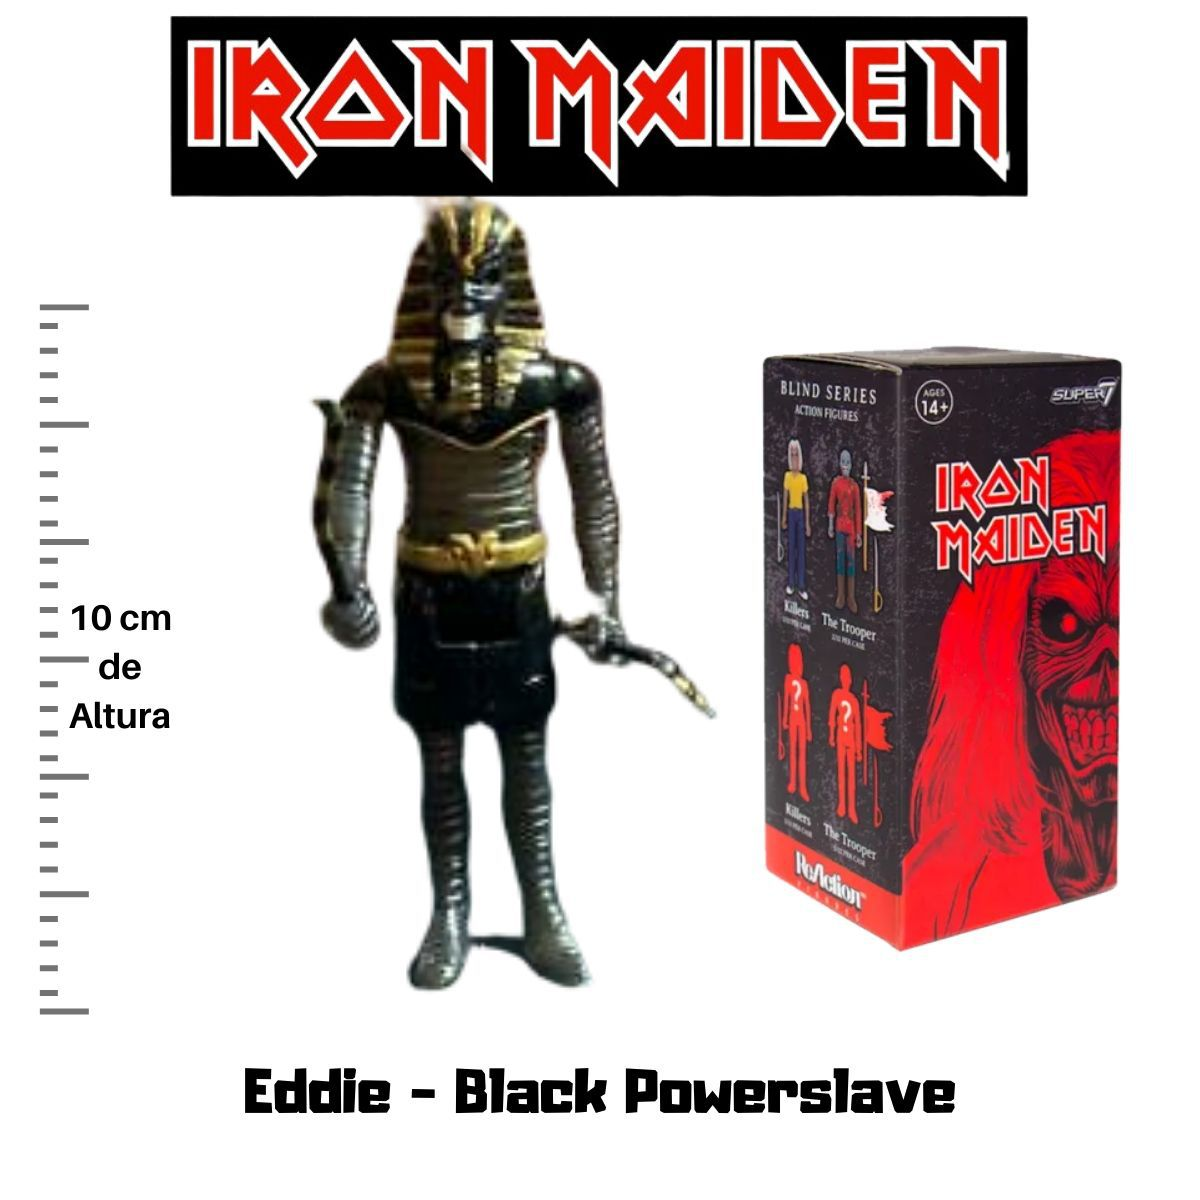 Boneco Action Figure Iron Maiden Reaction Eddie Black Powerslave  - Game Land Brinquedos